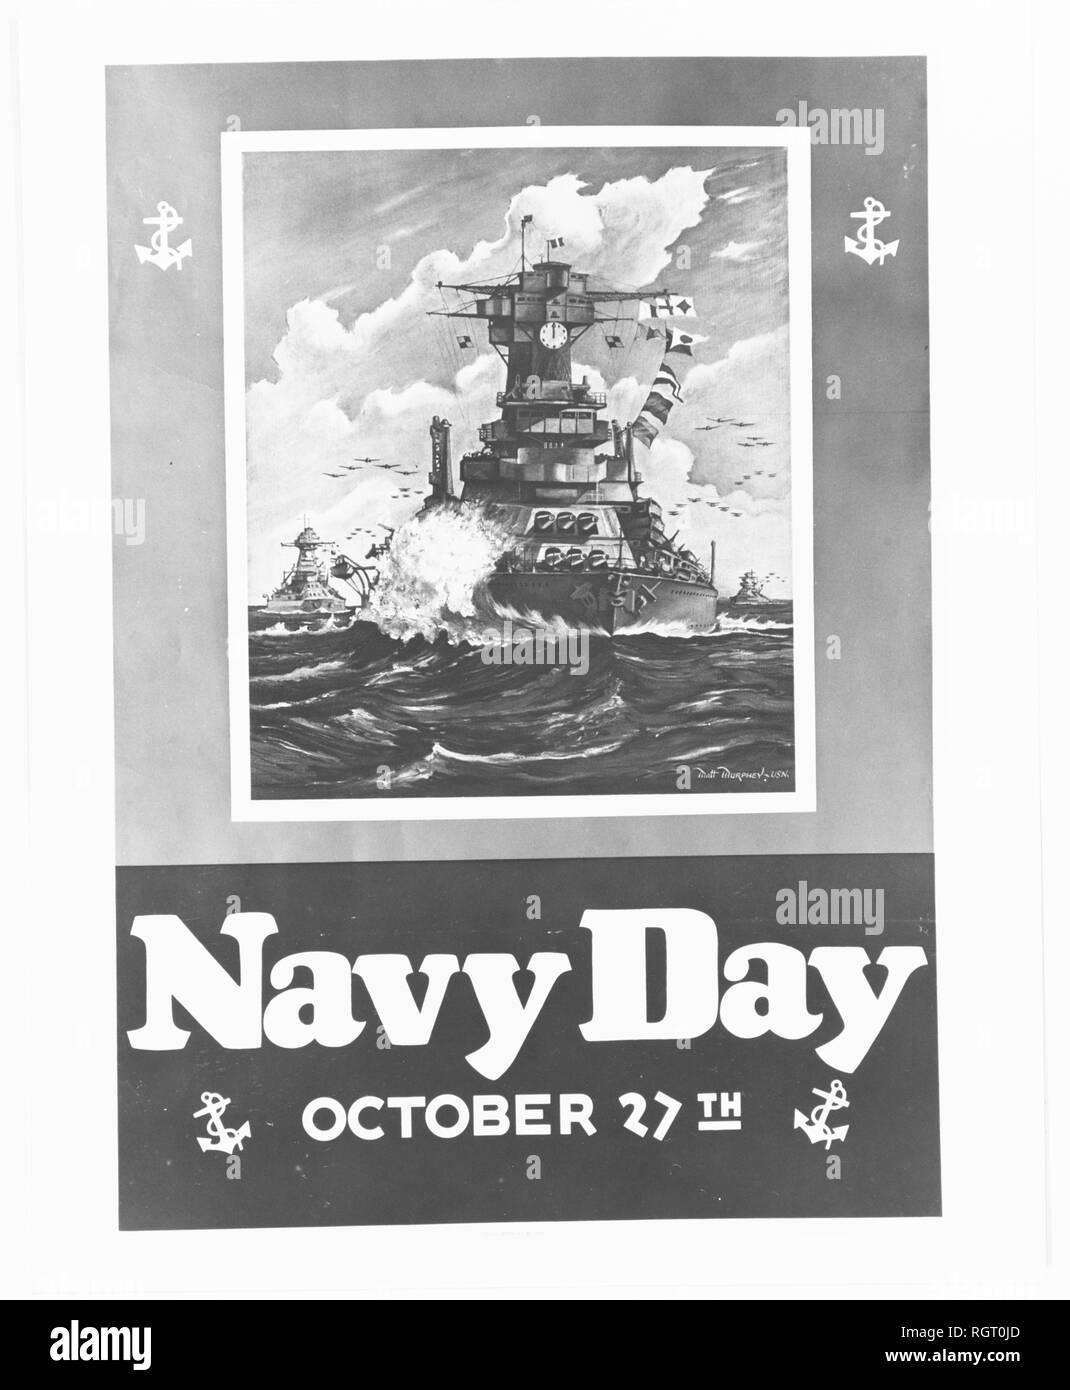 Navy Day poster 1940.jpg - RGT0JD 1RGT0JD - Stock Image